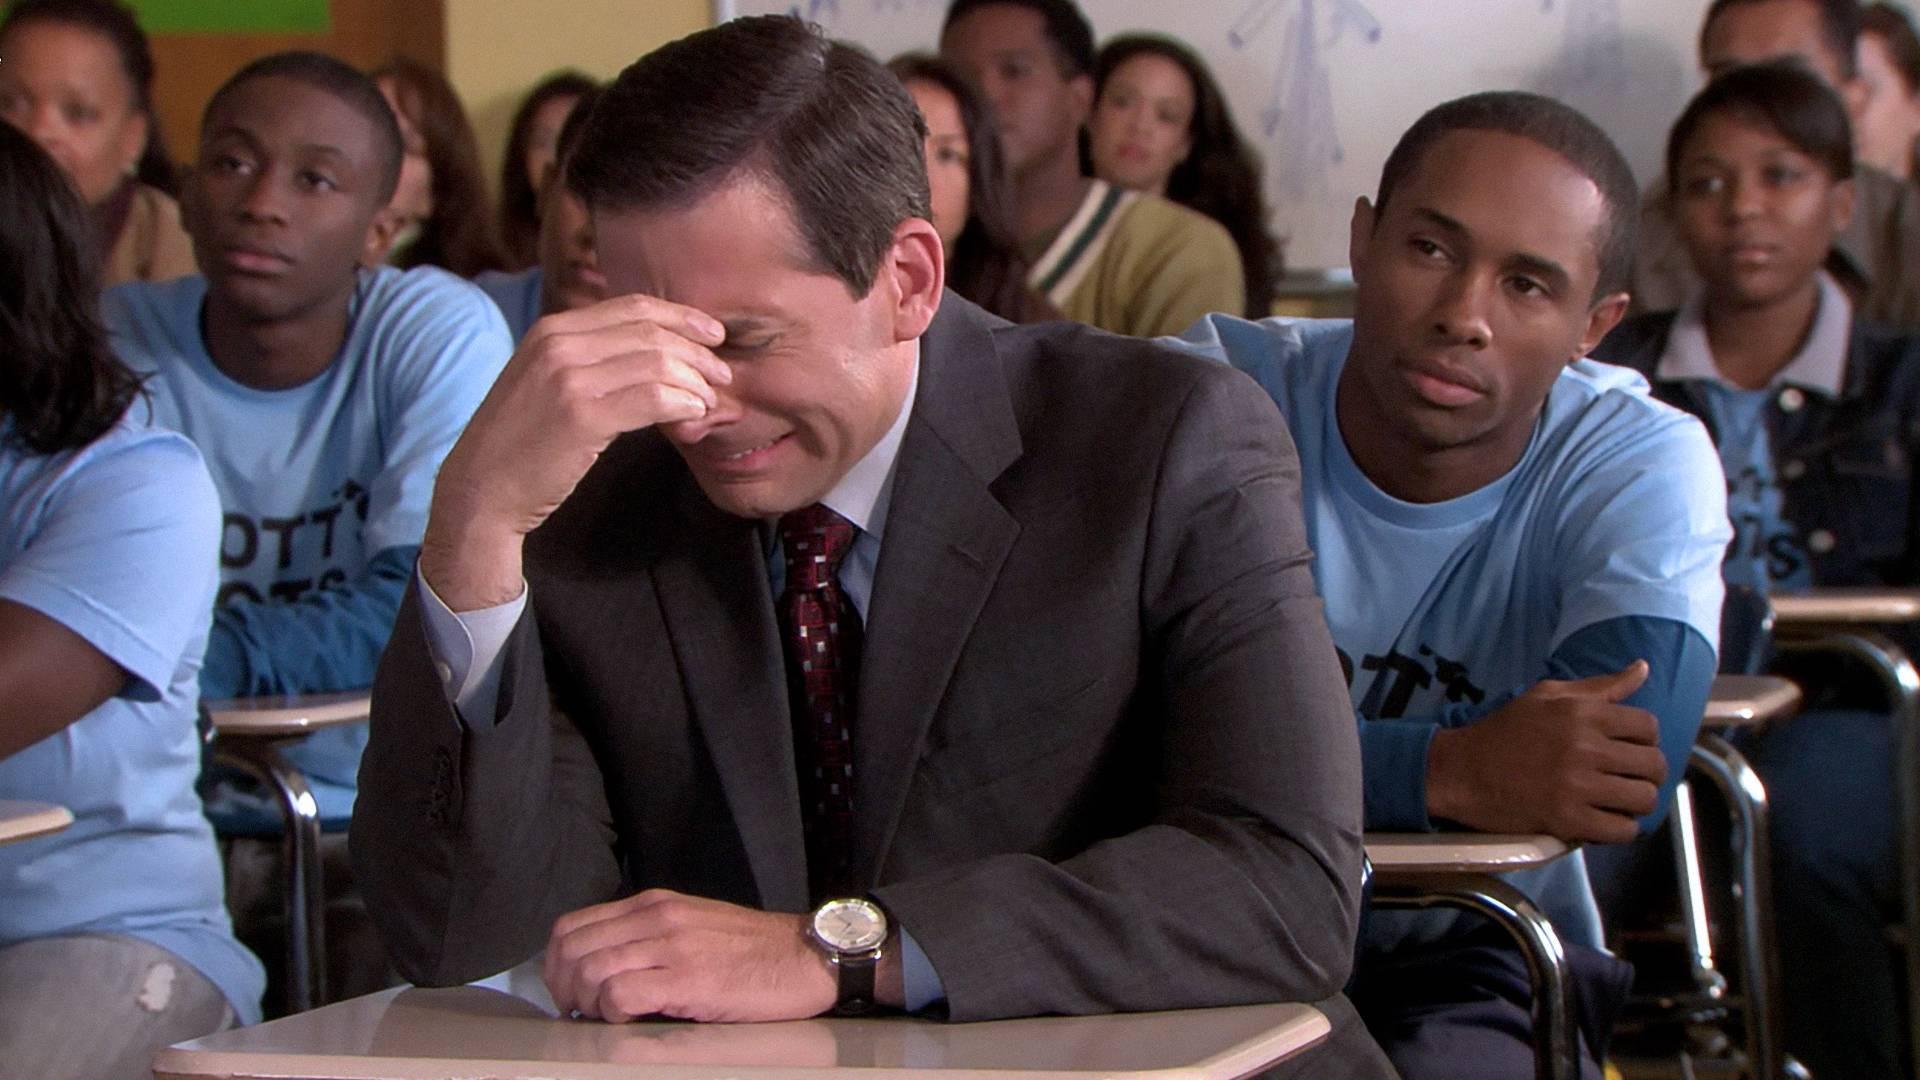 The Office Season 6 Episode 12